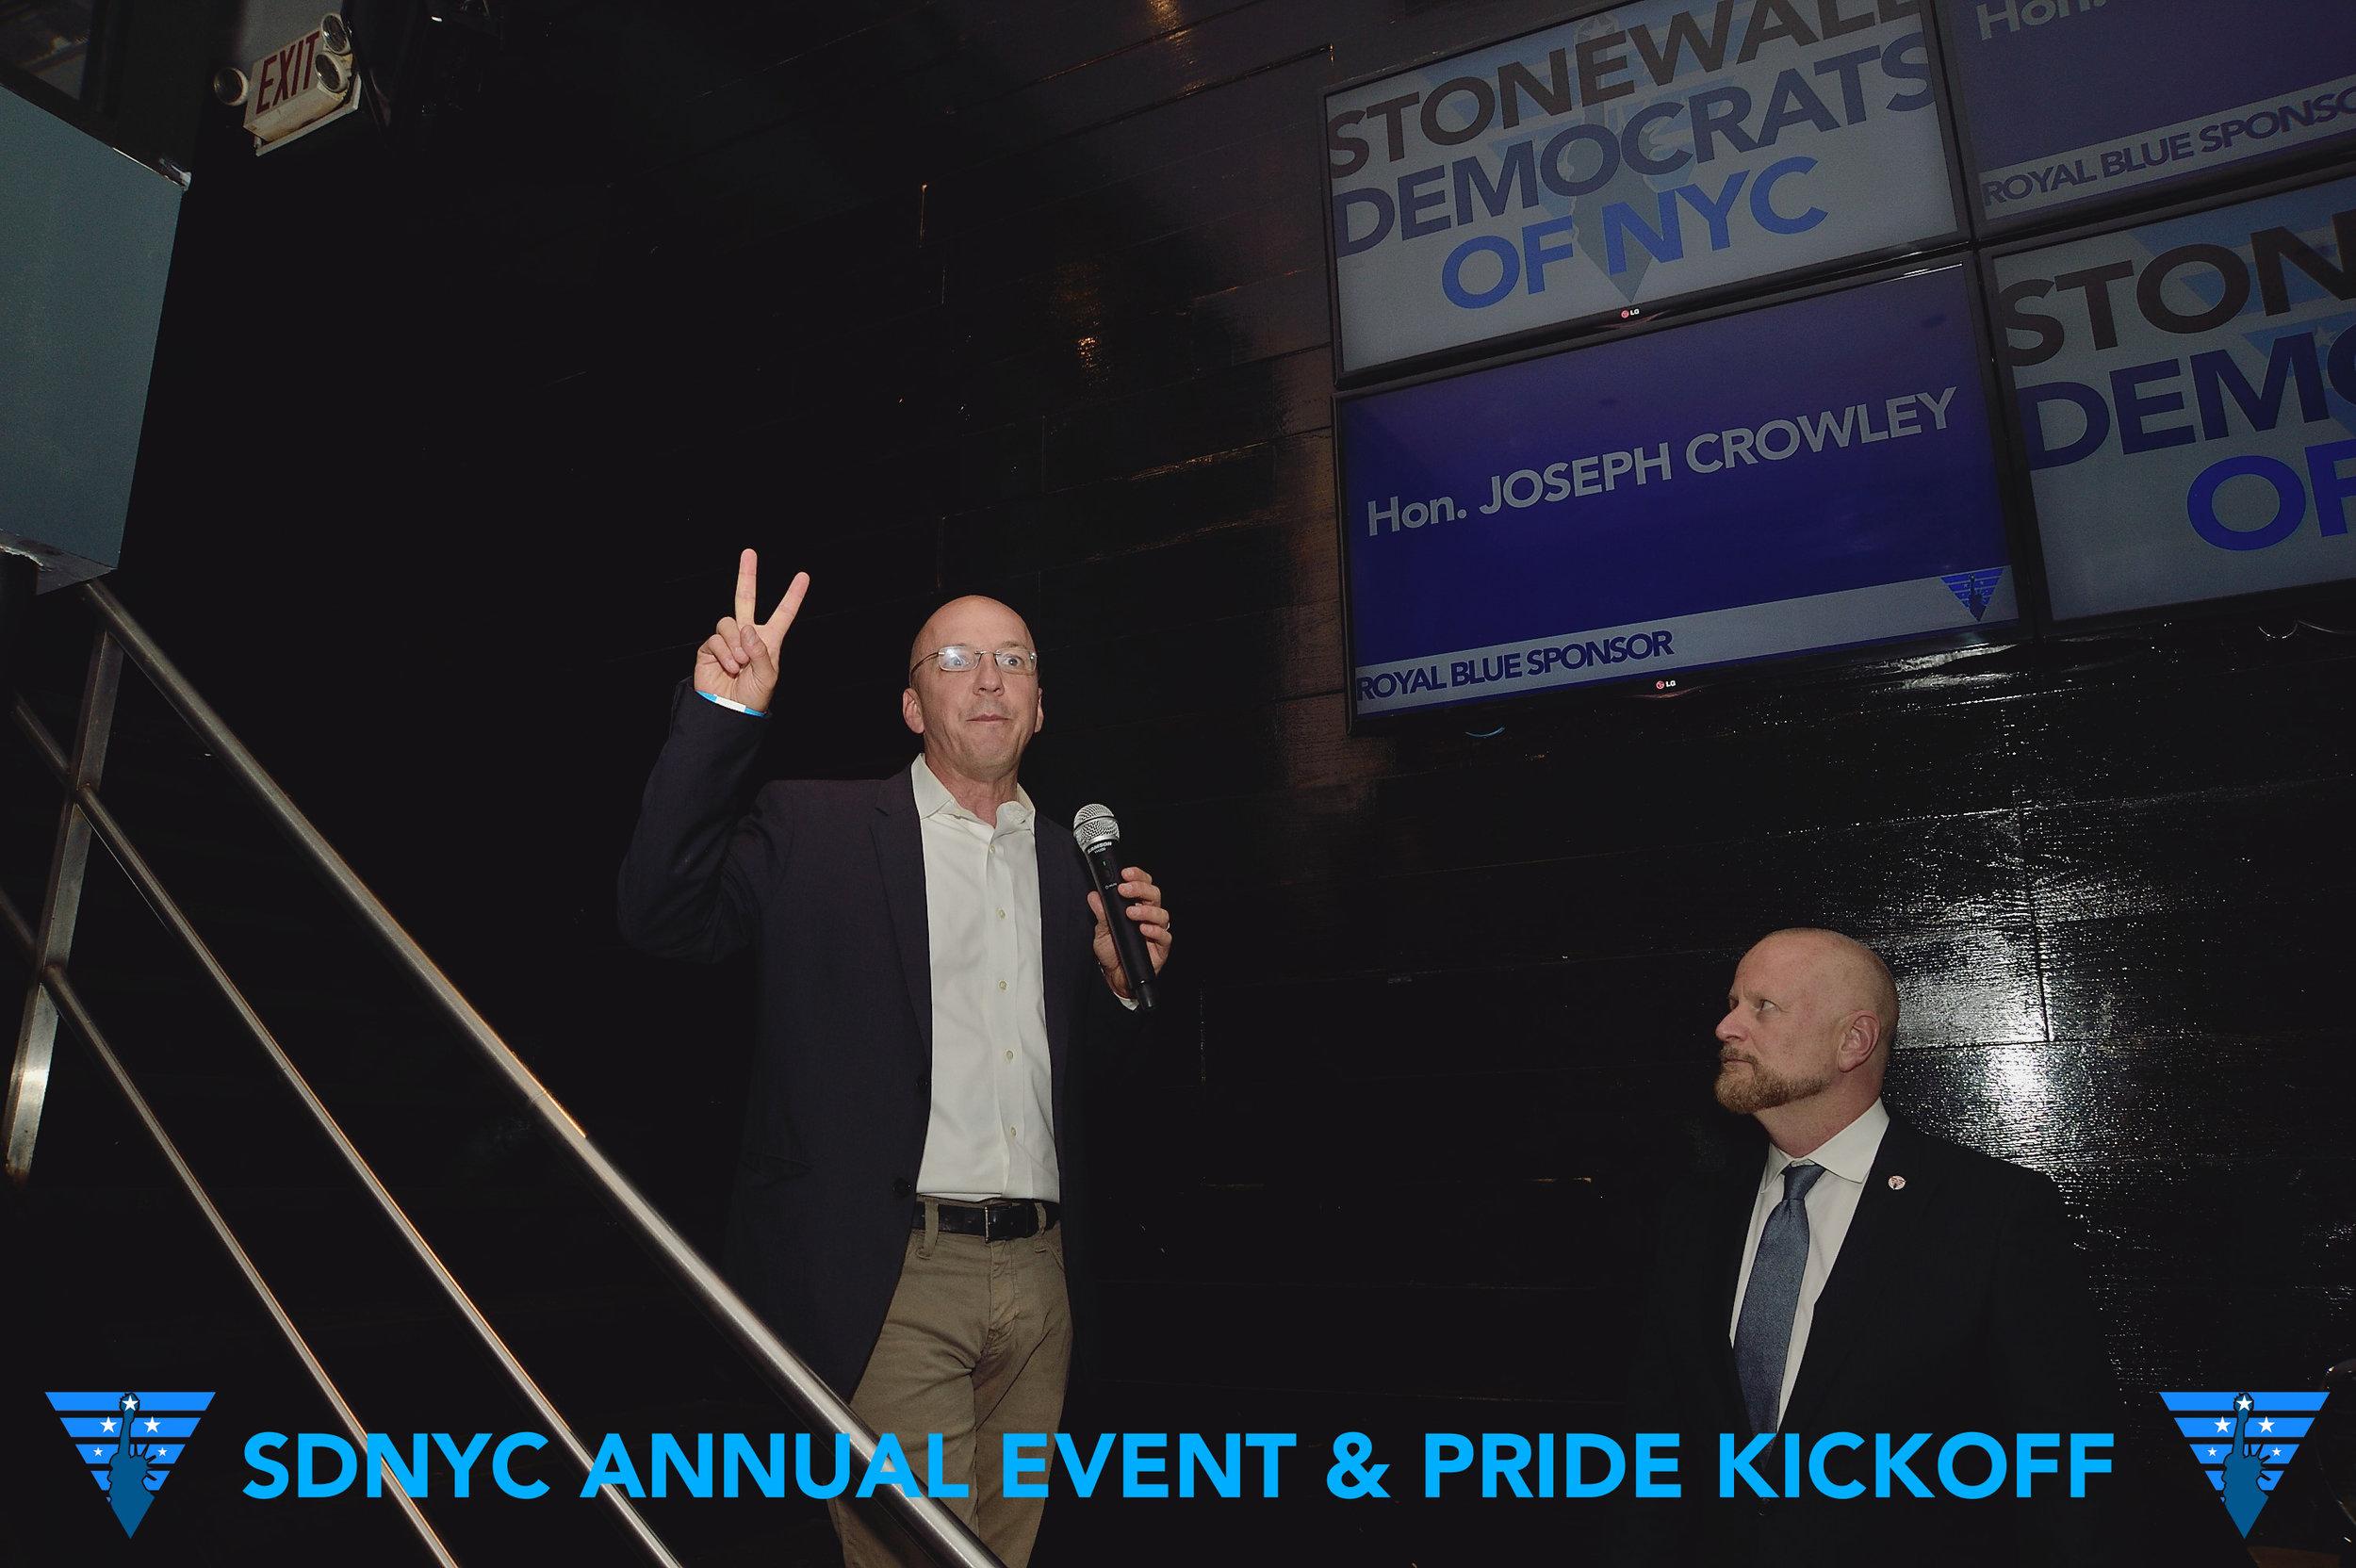 SDNYC ANNUAL EVENT 201847.jpg